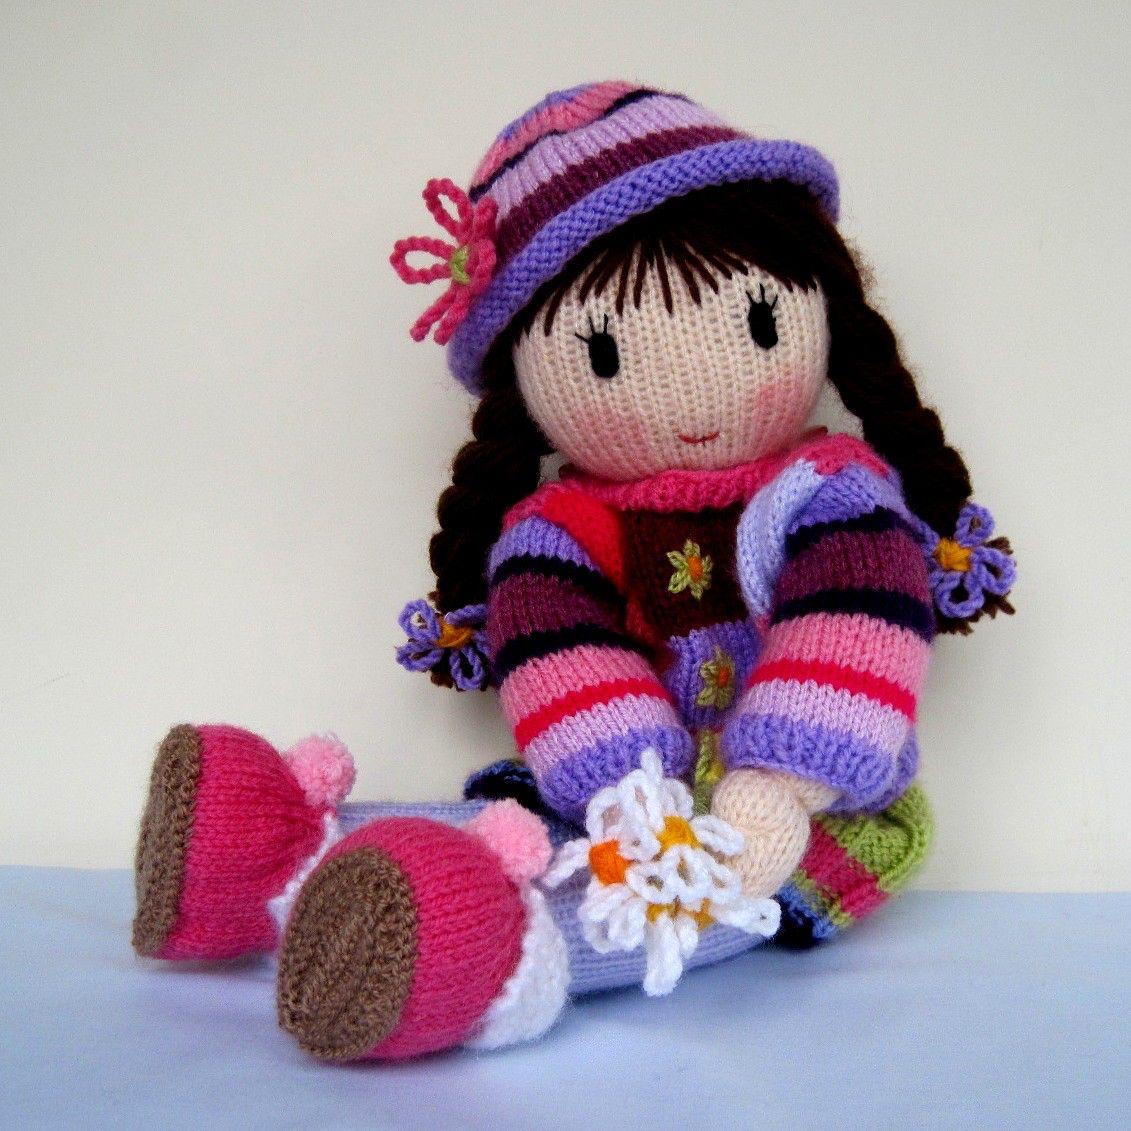 Posy Doll - PDF knitting pattern - INSTANT DOWNLOAD by dollytime on Etsy https://www.etsy.com/listing/71928667/posy-doll-pdf-knitting-pattern-instant